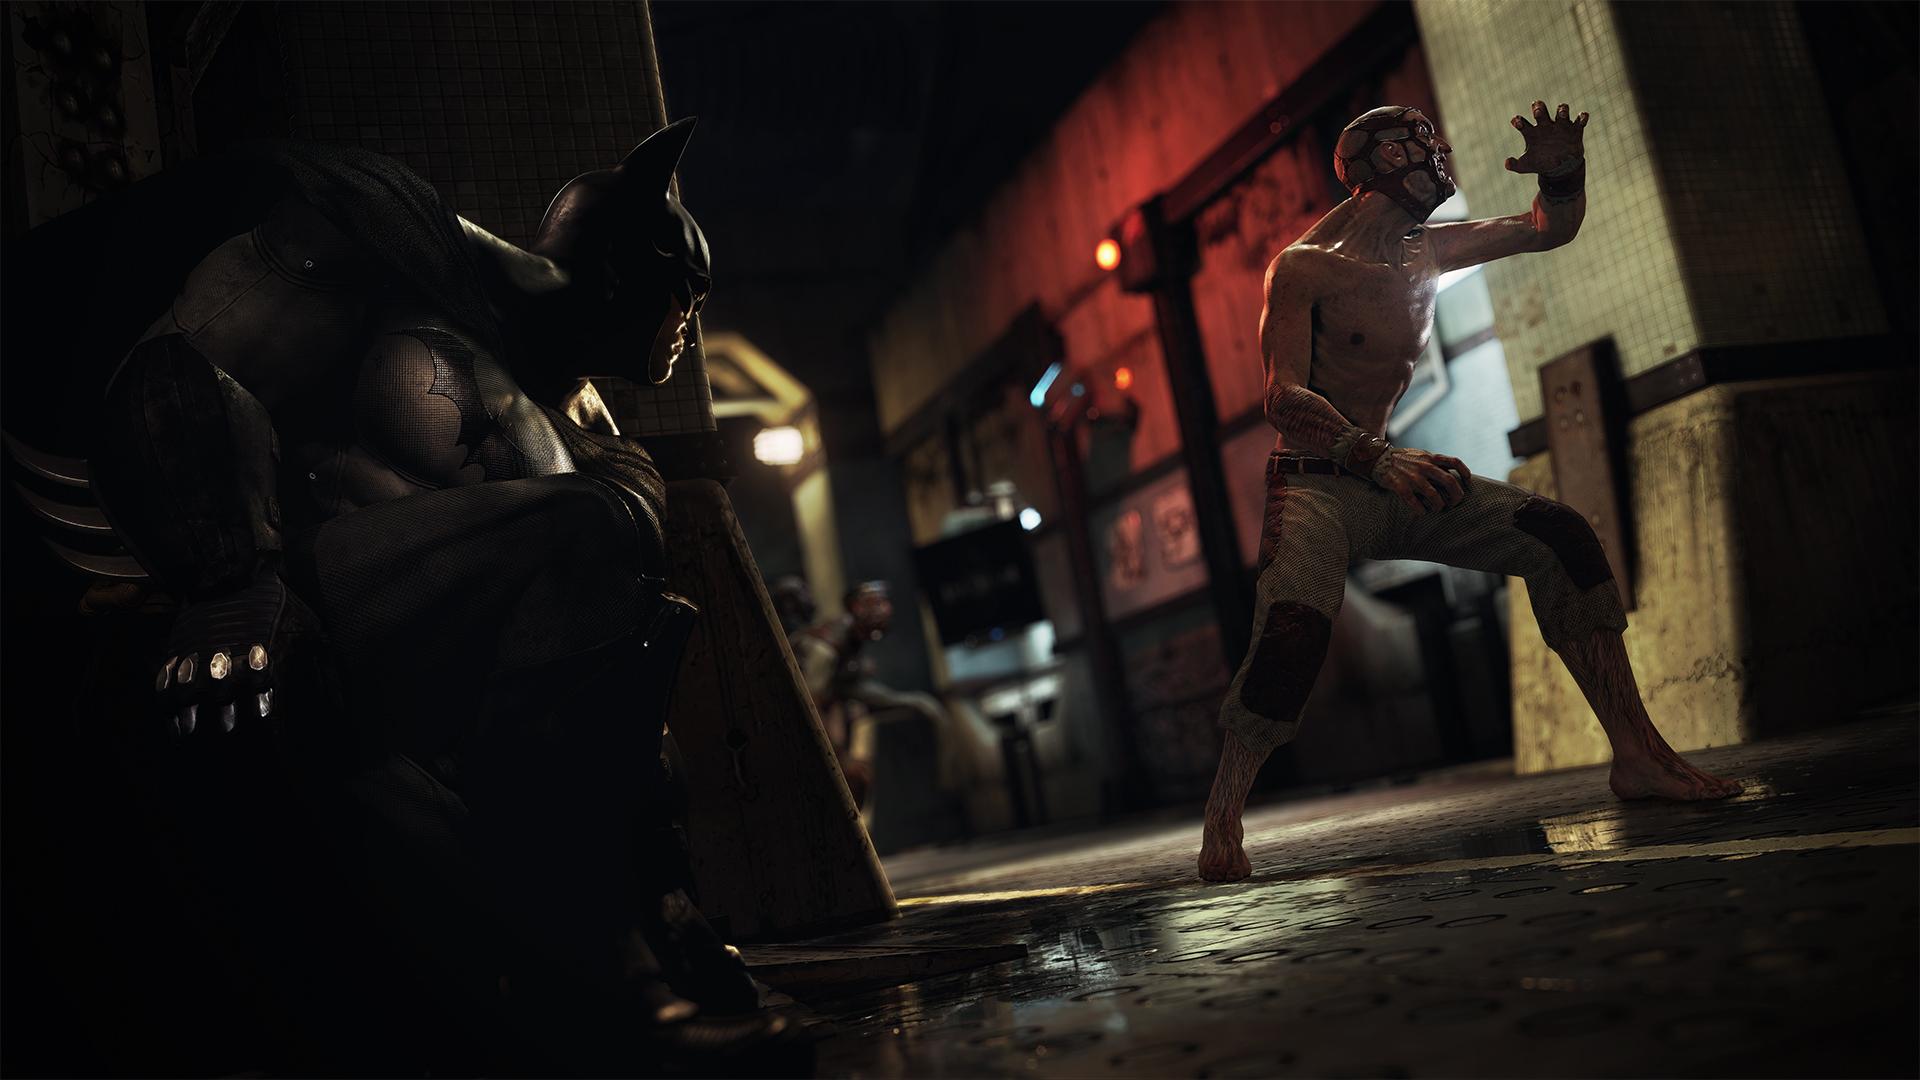 Return to Arkham: Ältere Batman-Actionspiele neu auf Unreal Engine 4 - Batman: Return to Arkham (Bild: Warner Bros)